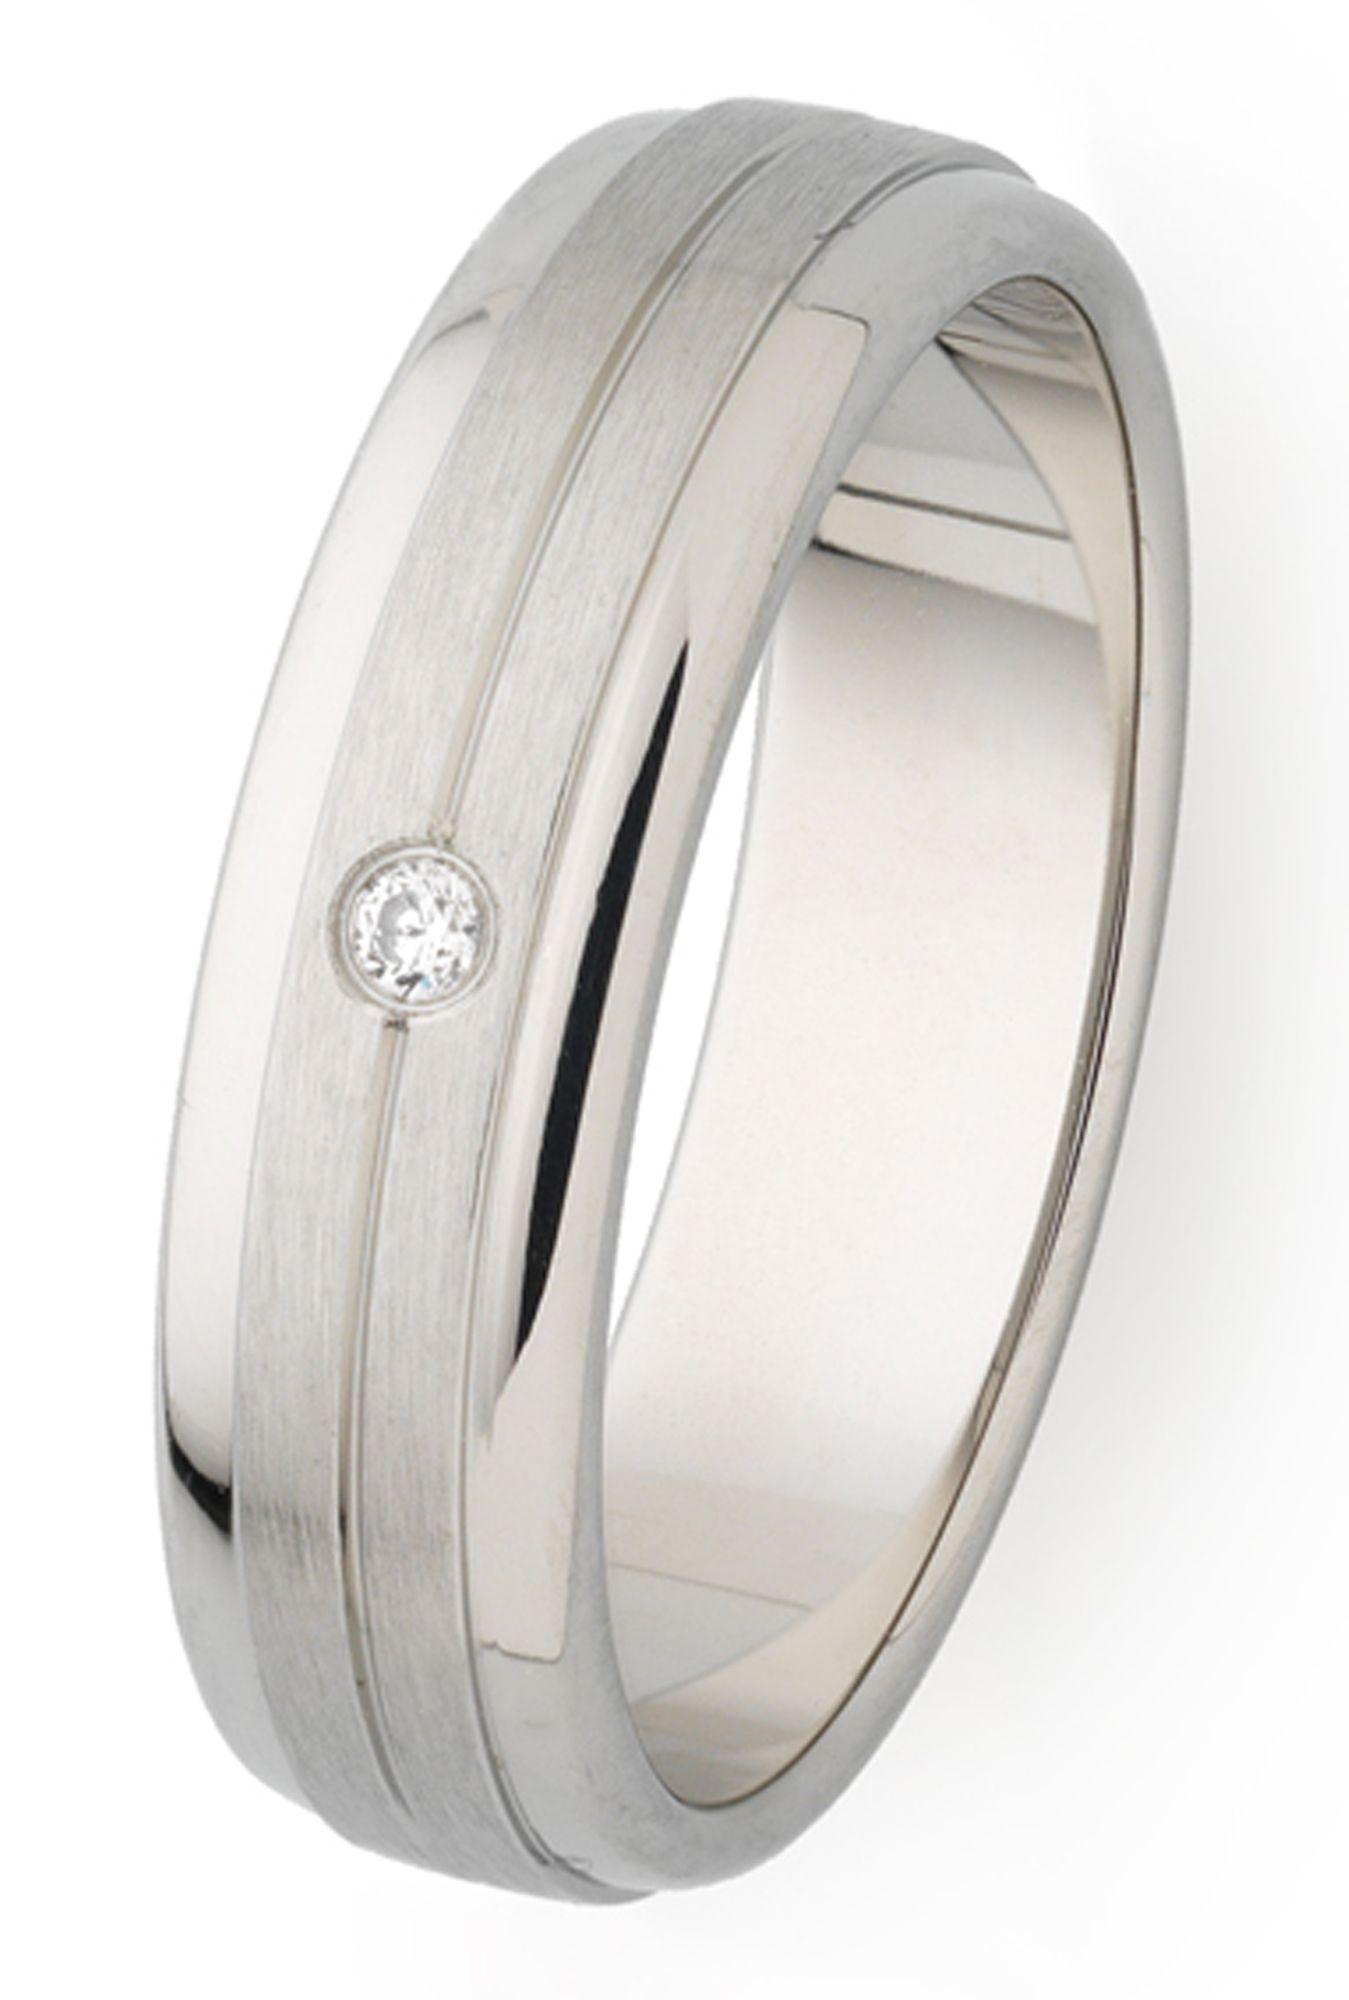 XENOX X2547/56 Damen Ring Edelstahl Silber weiß 56 (17.8)